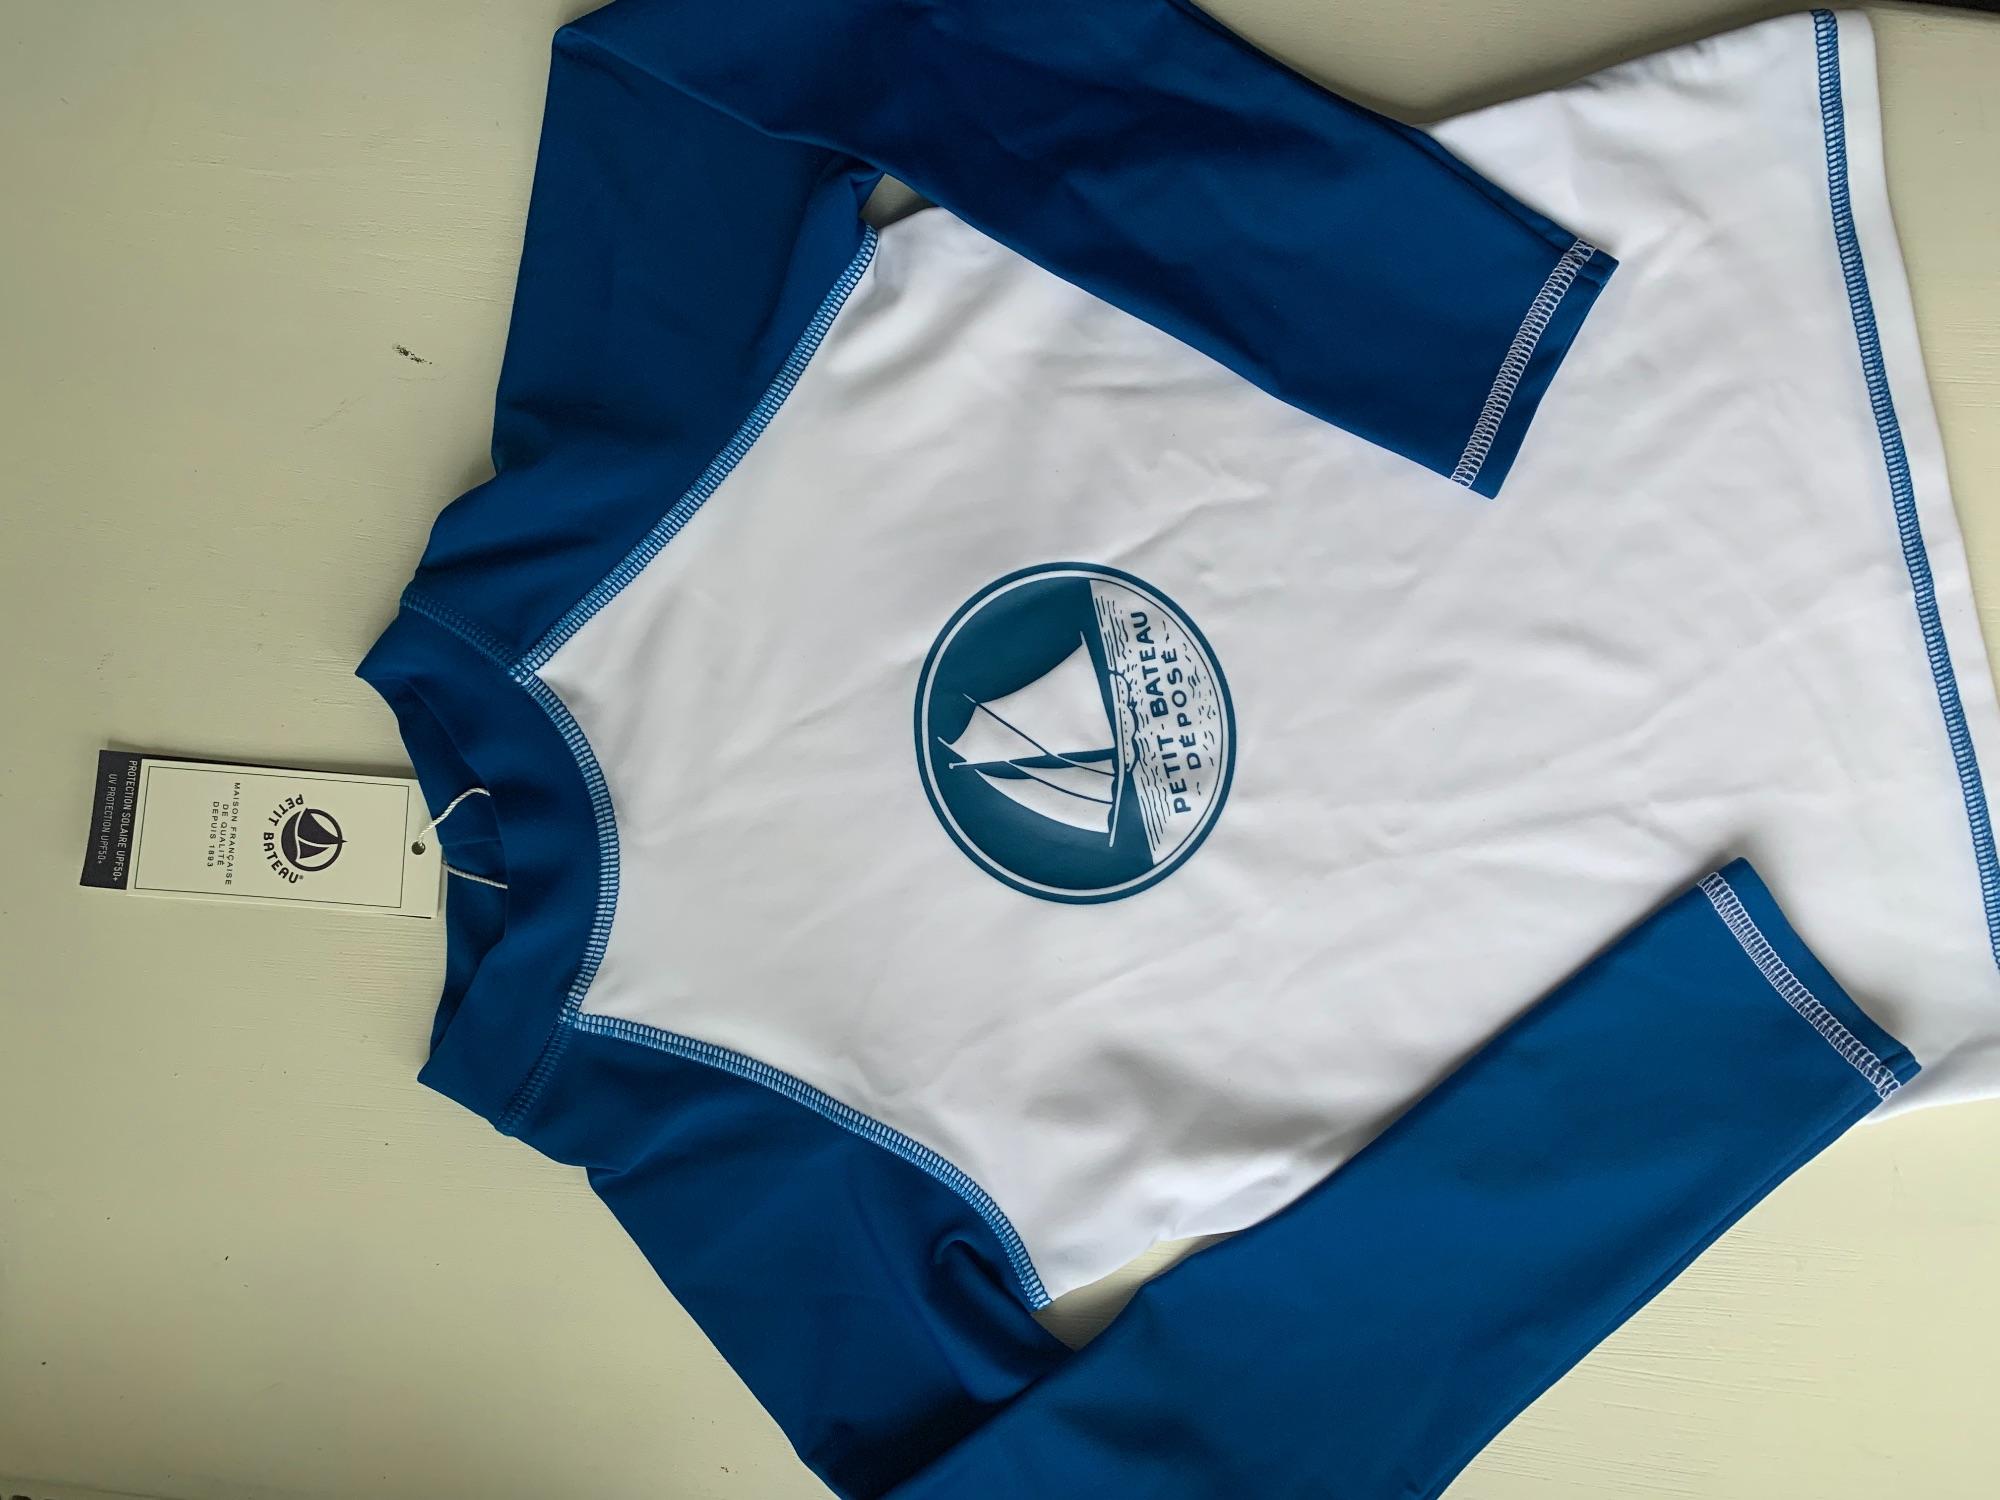 Nieuw: Petit Bateau UV zwem shirtje